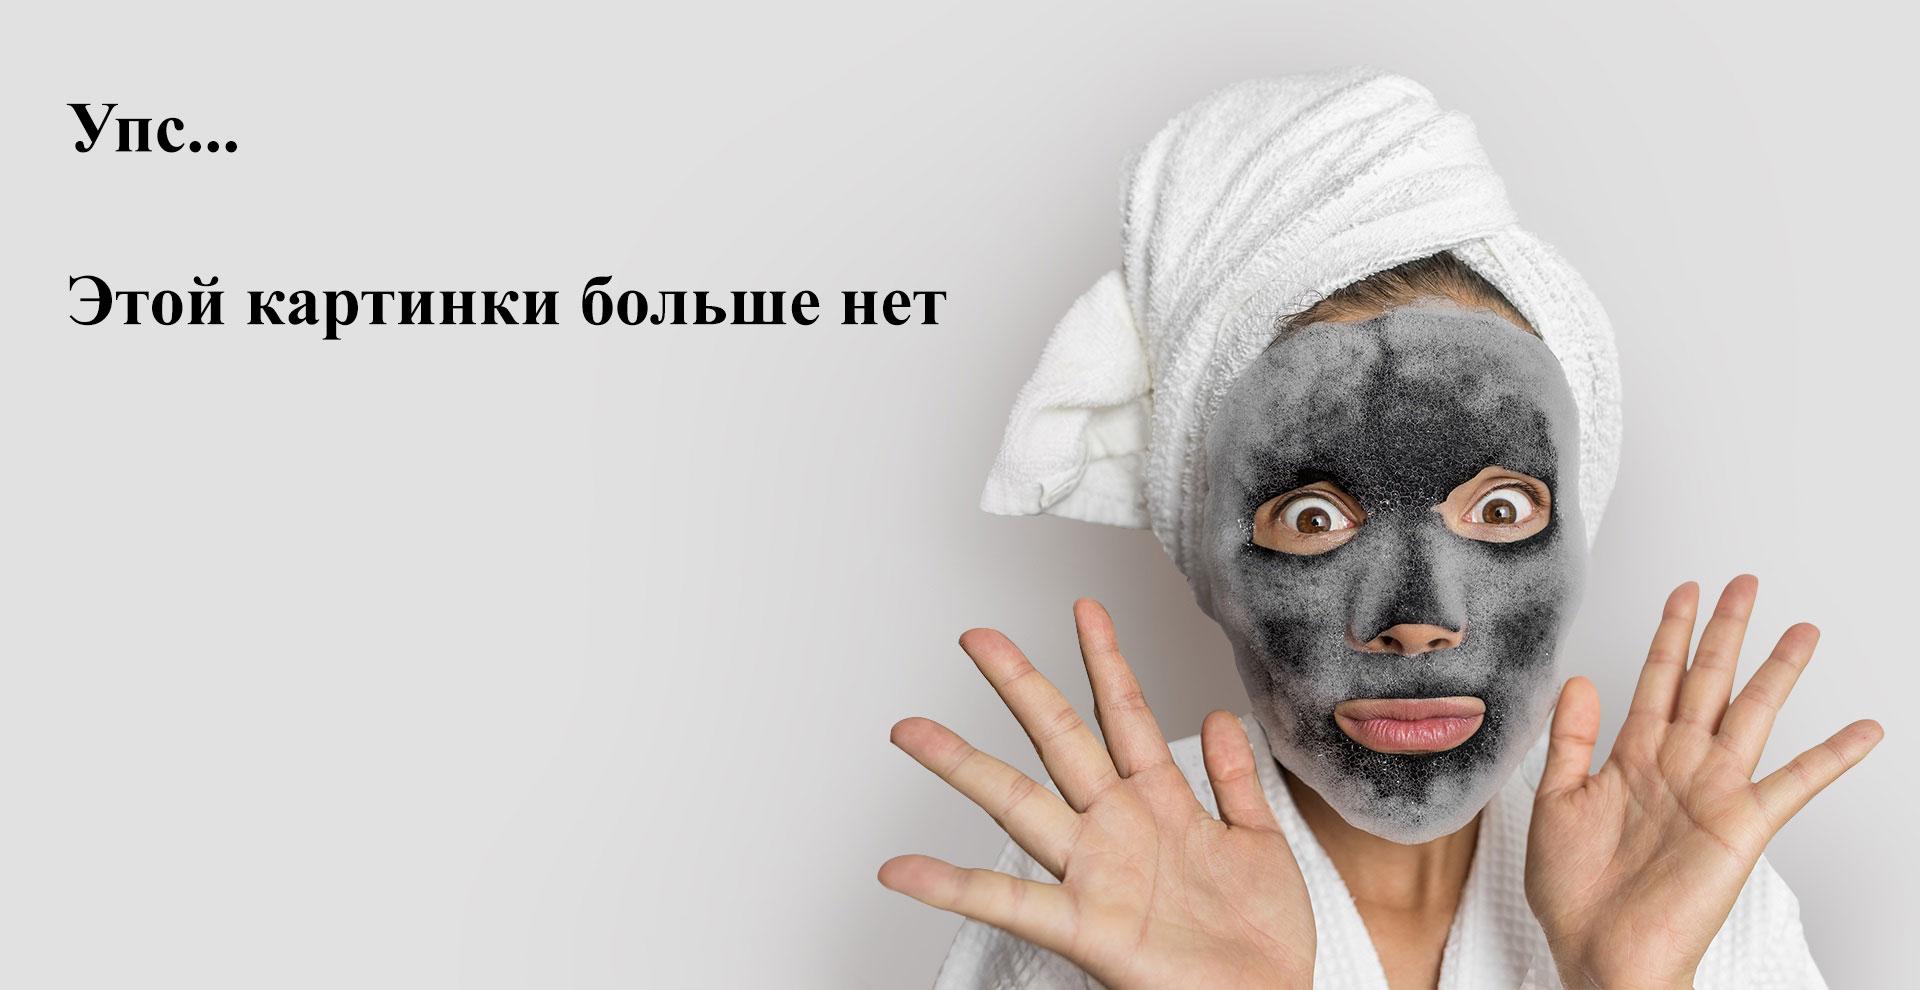 ONIQ, Гель-лак Tie-dye №170s, Vanilla white